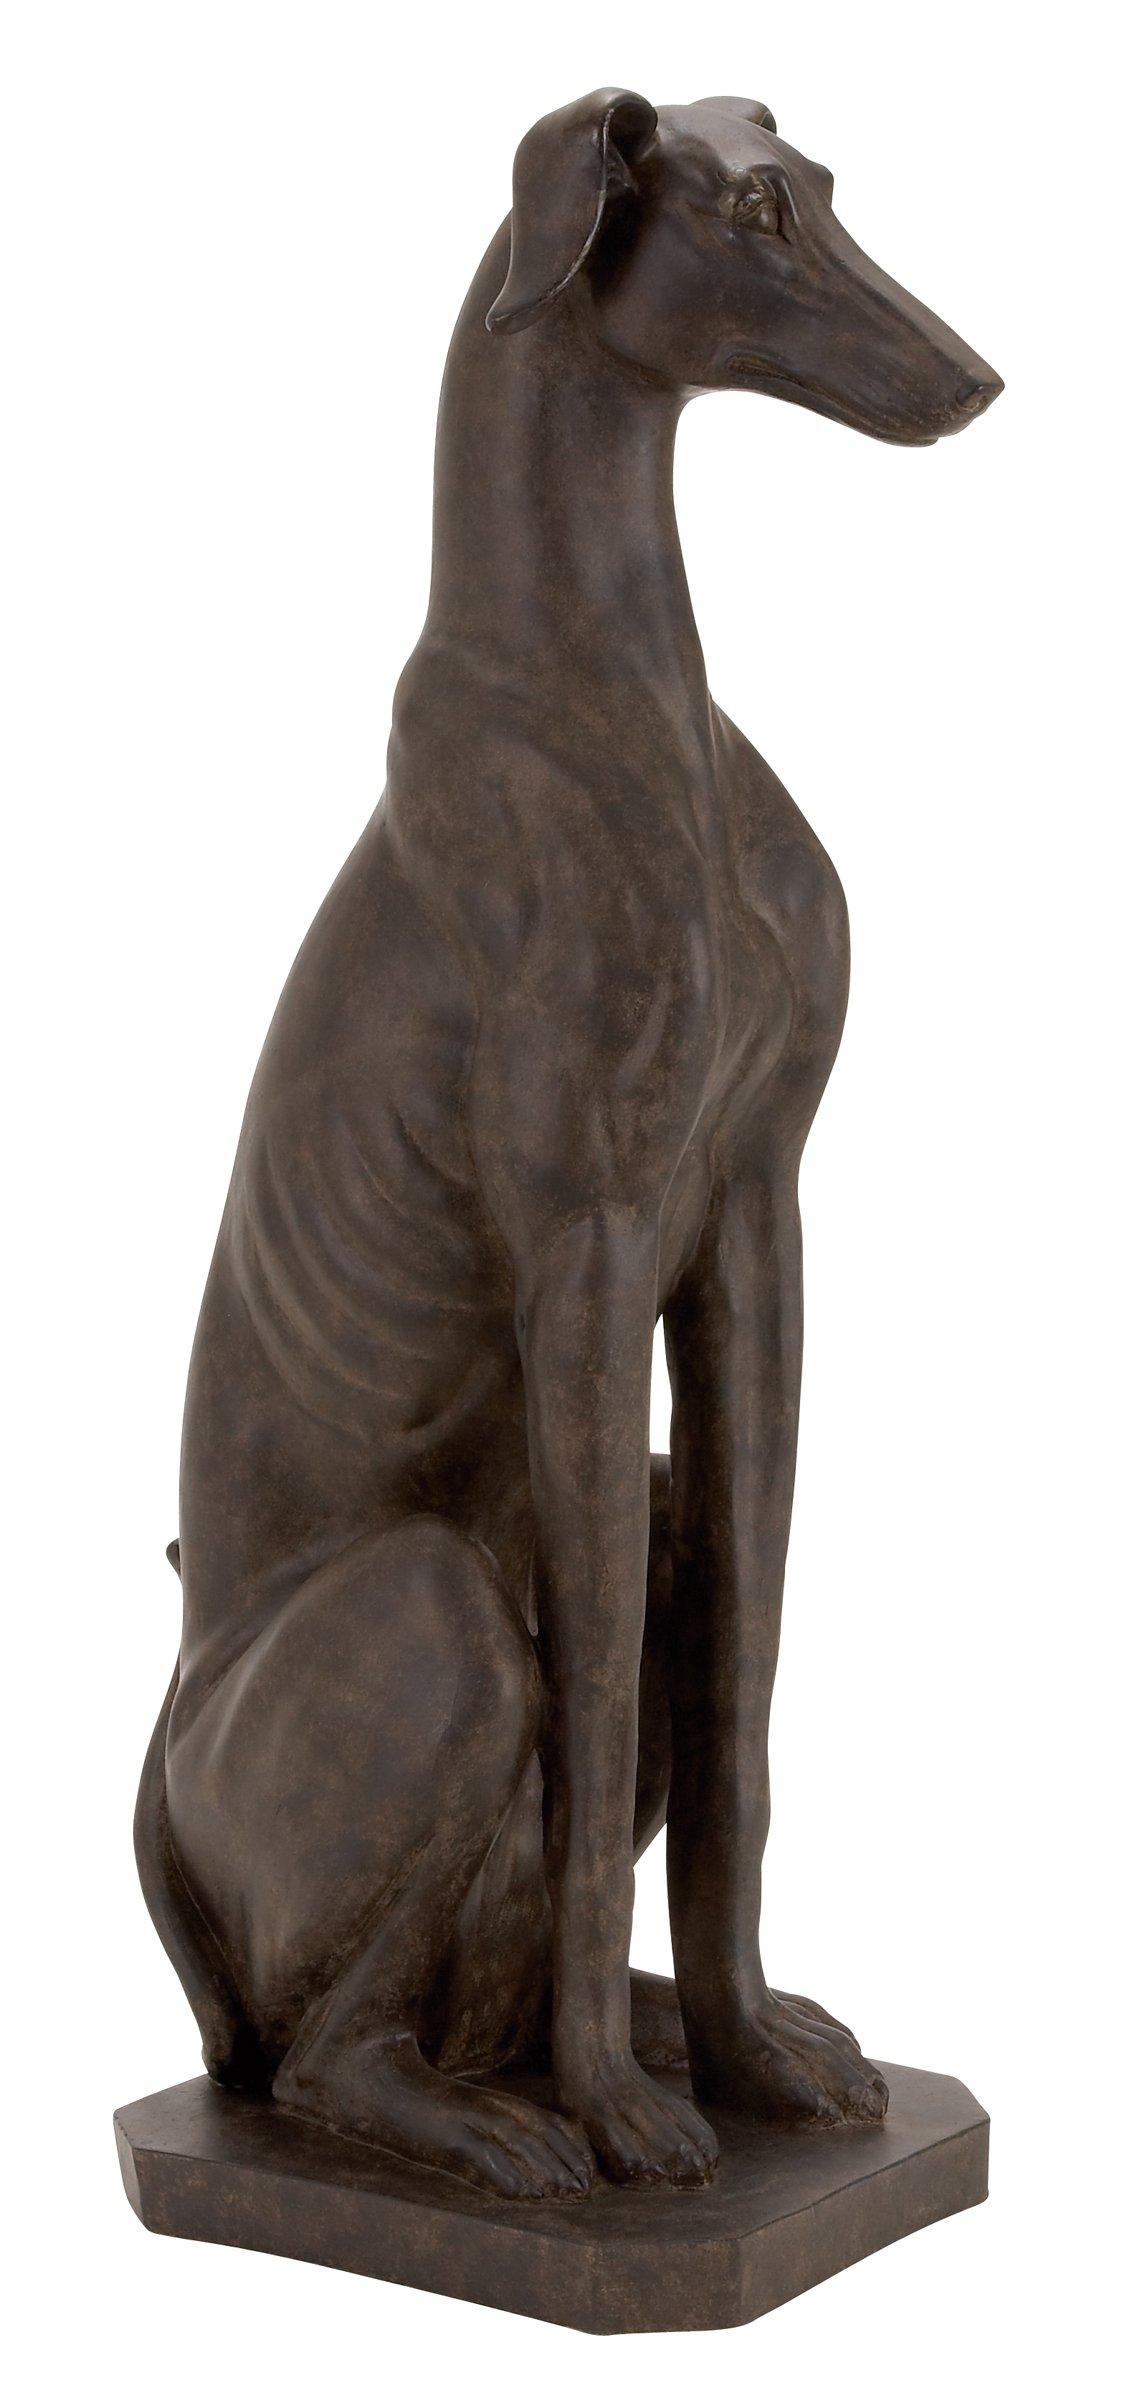 Deco 79 Dog Sculpture by Deco 79